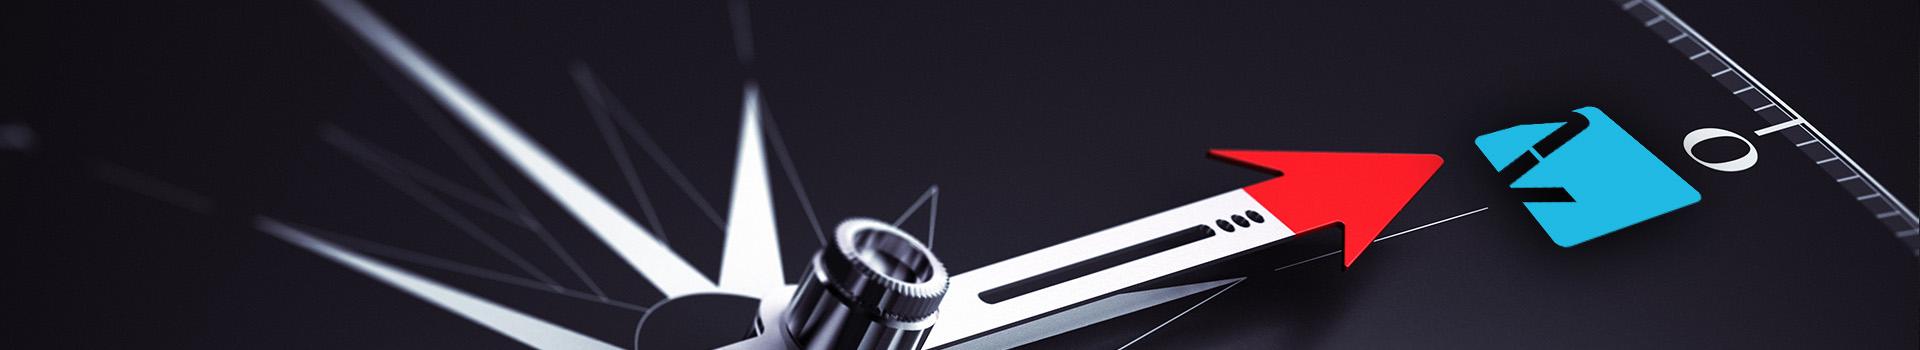 En kompassnål som peker på Avella-logoen